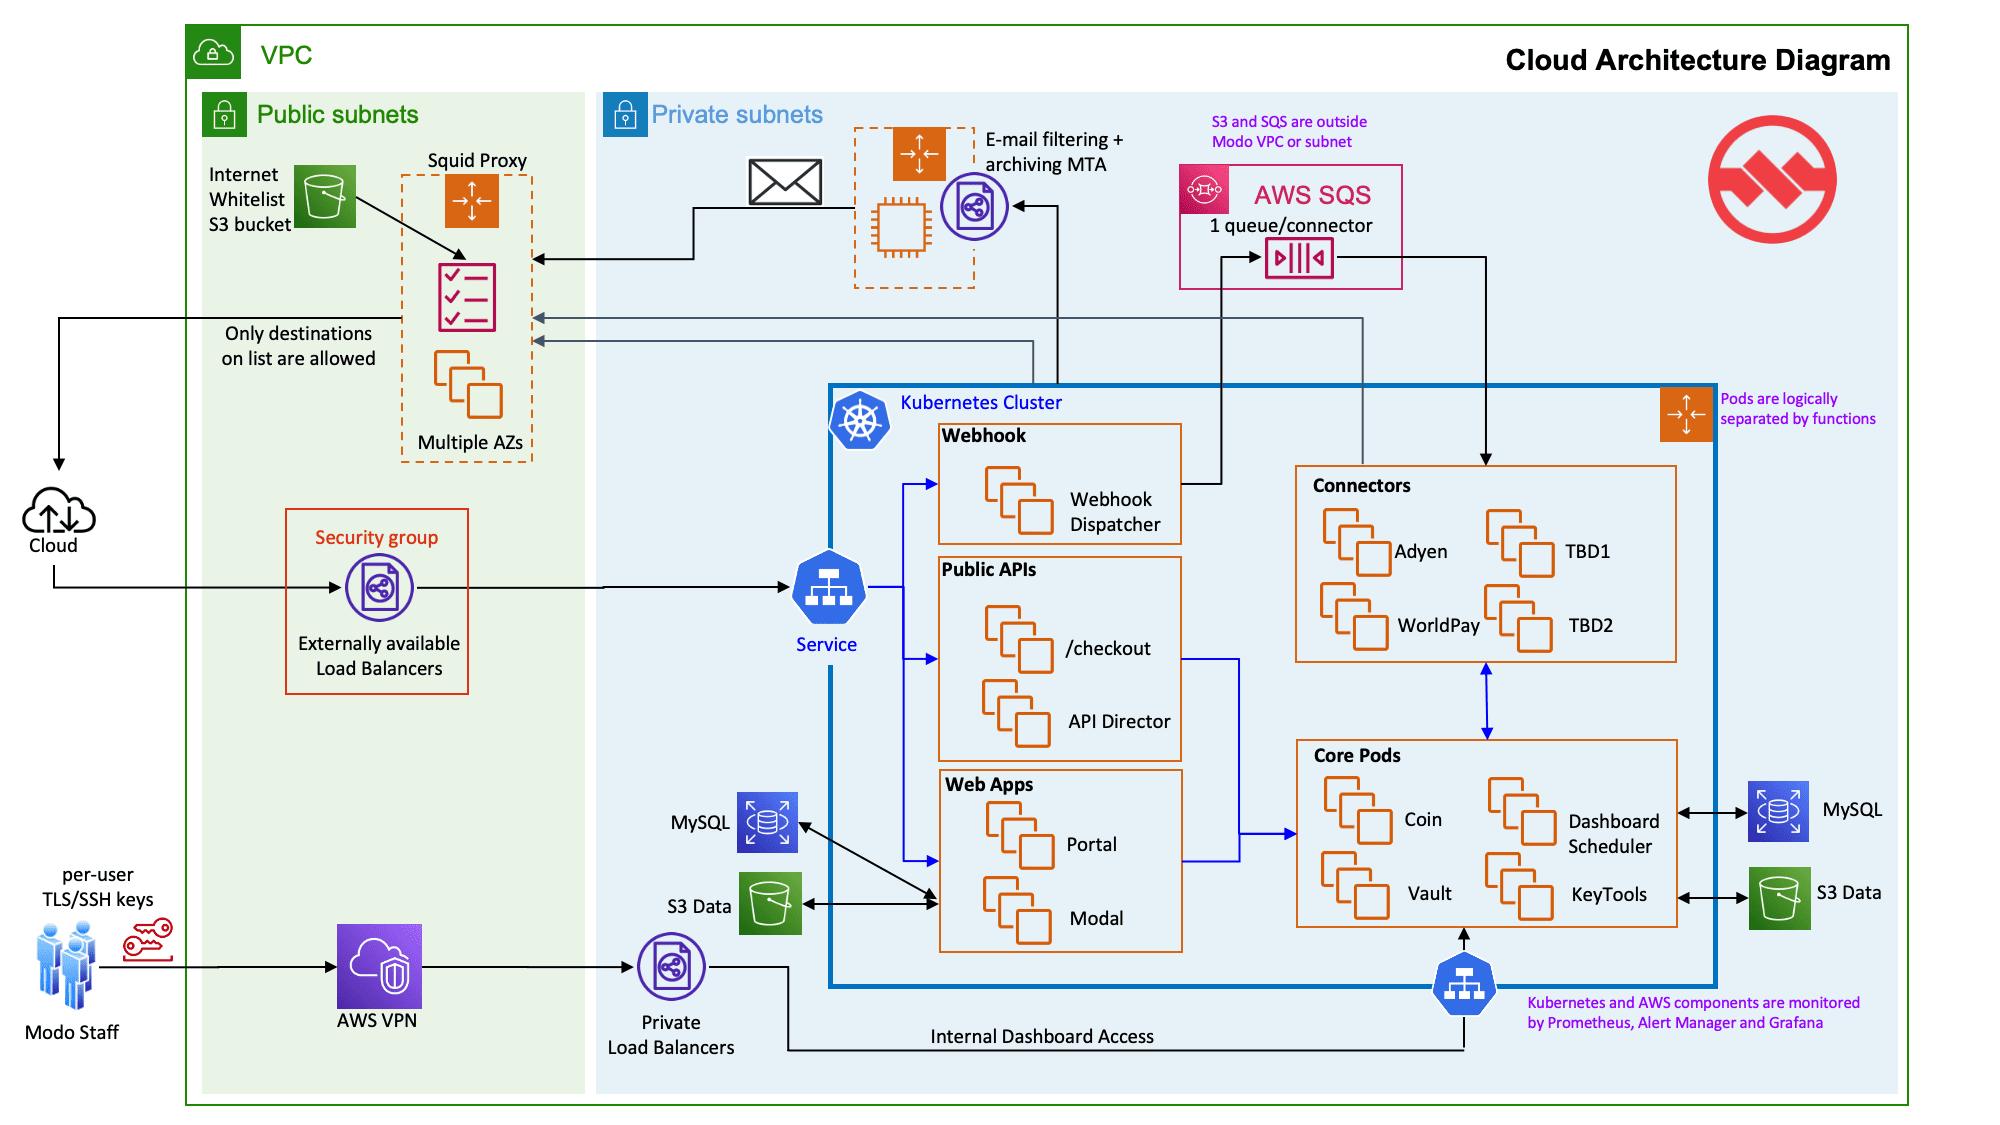 Modo Cloud Architecture Diagram